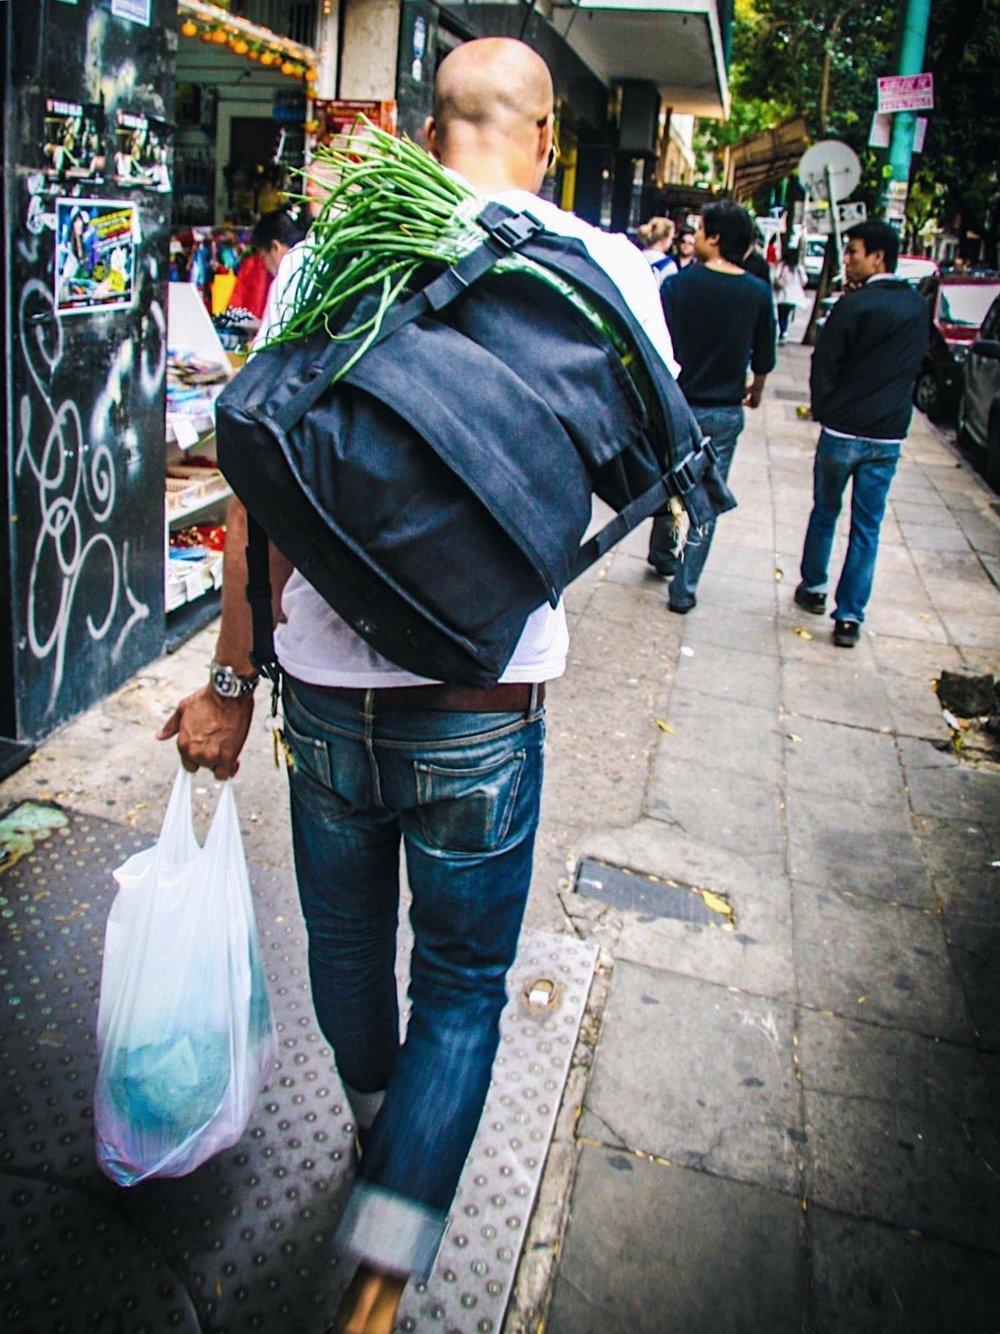 Shopping. Buenos Aires, Argentina. Photo Ali Lazar